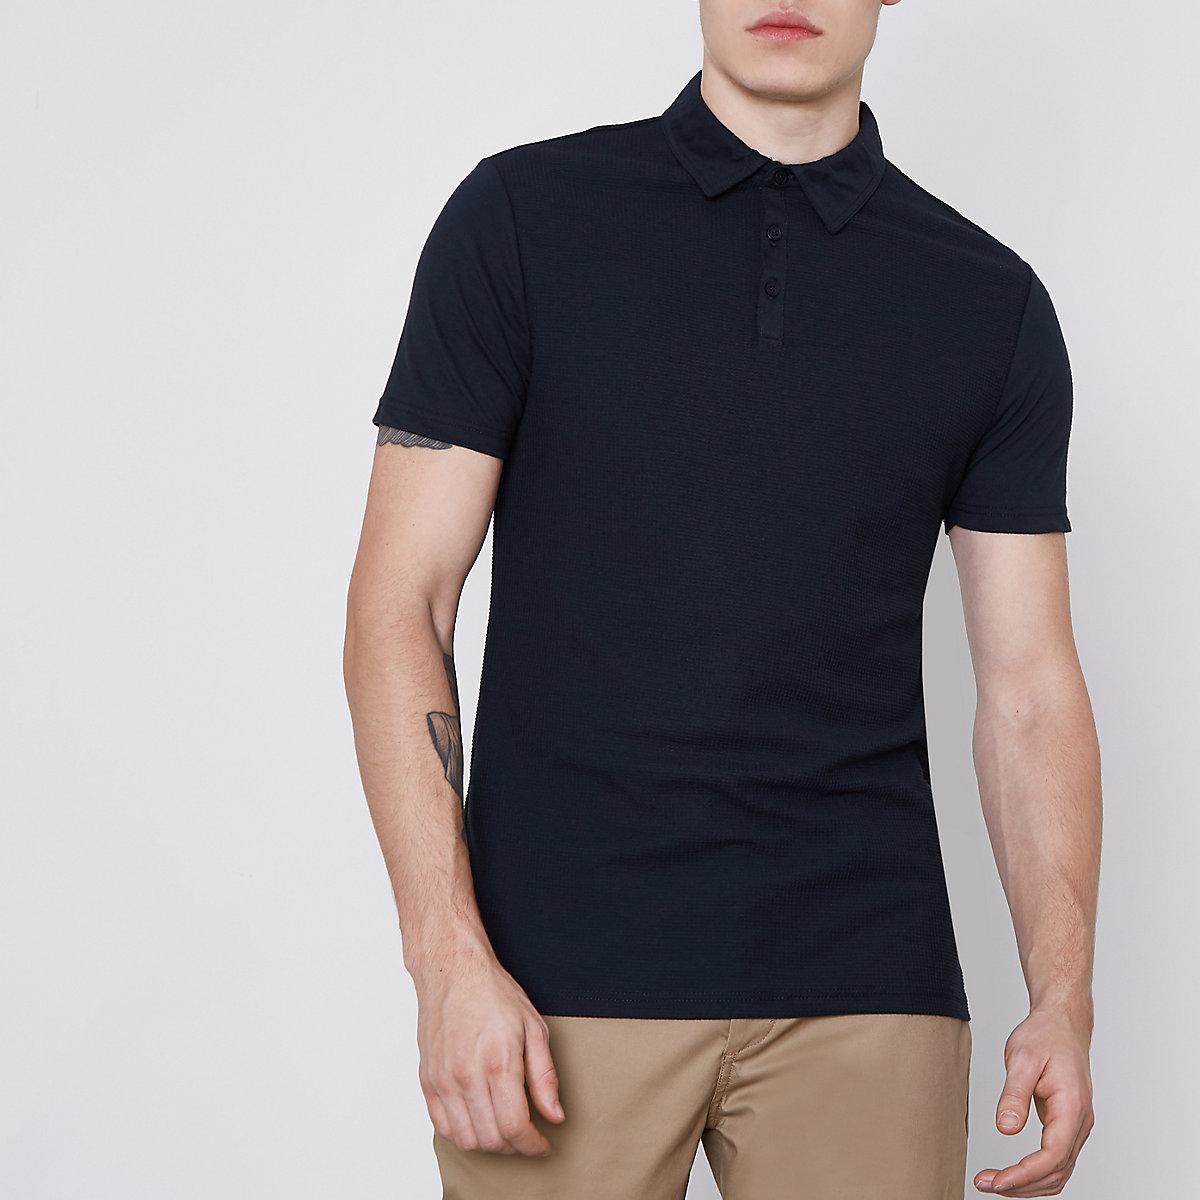 Slim Fit Polohemd mit Waffelstruktur